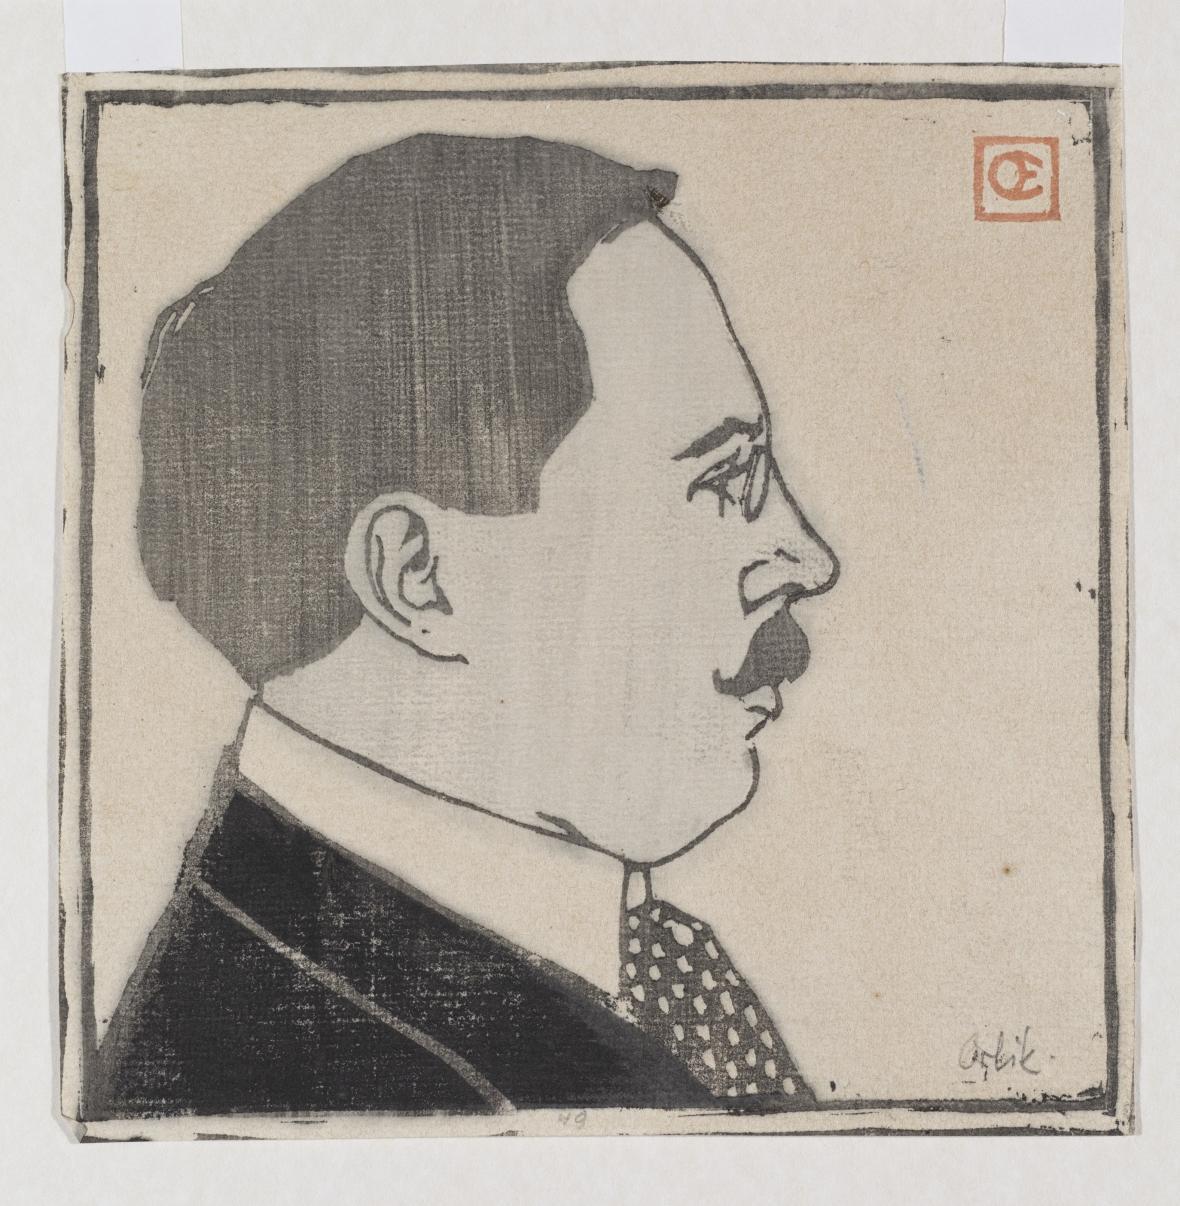 Emil Orlik / Architekt Josef Hoffmann, 1903